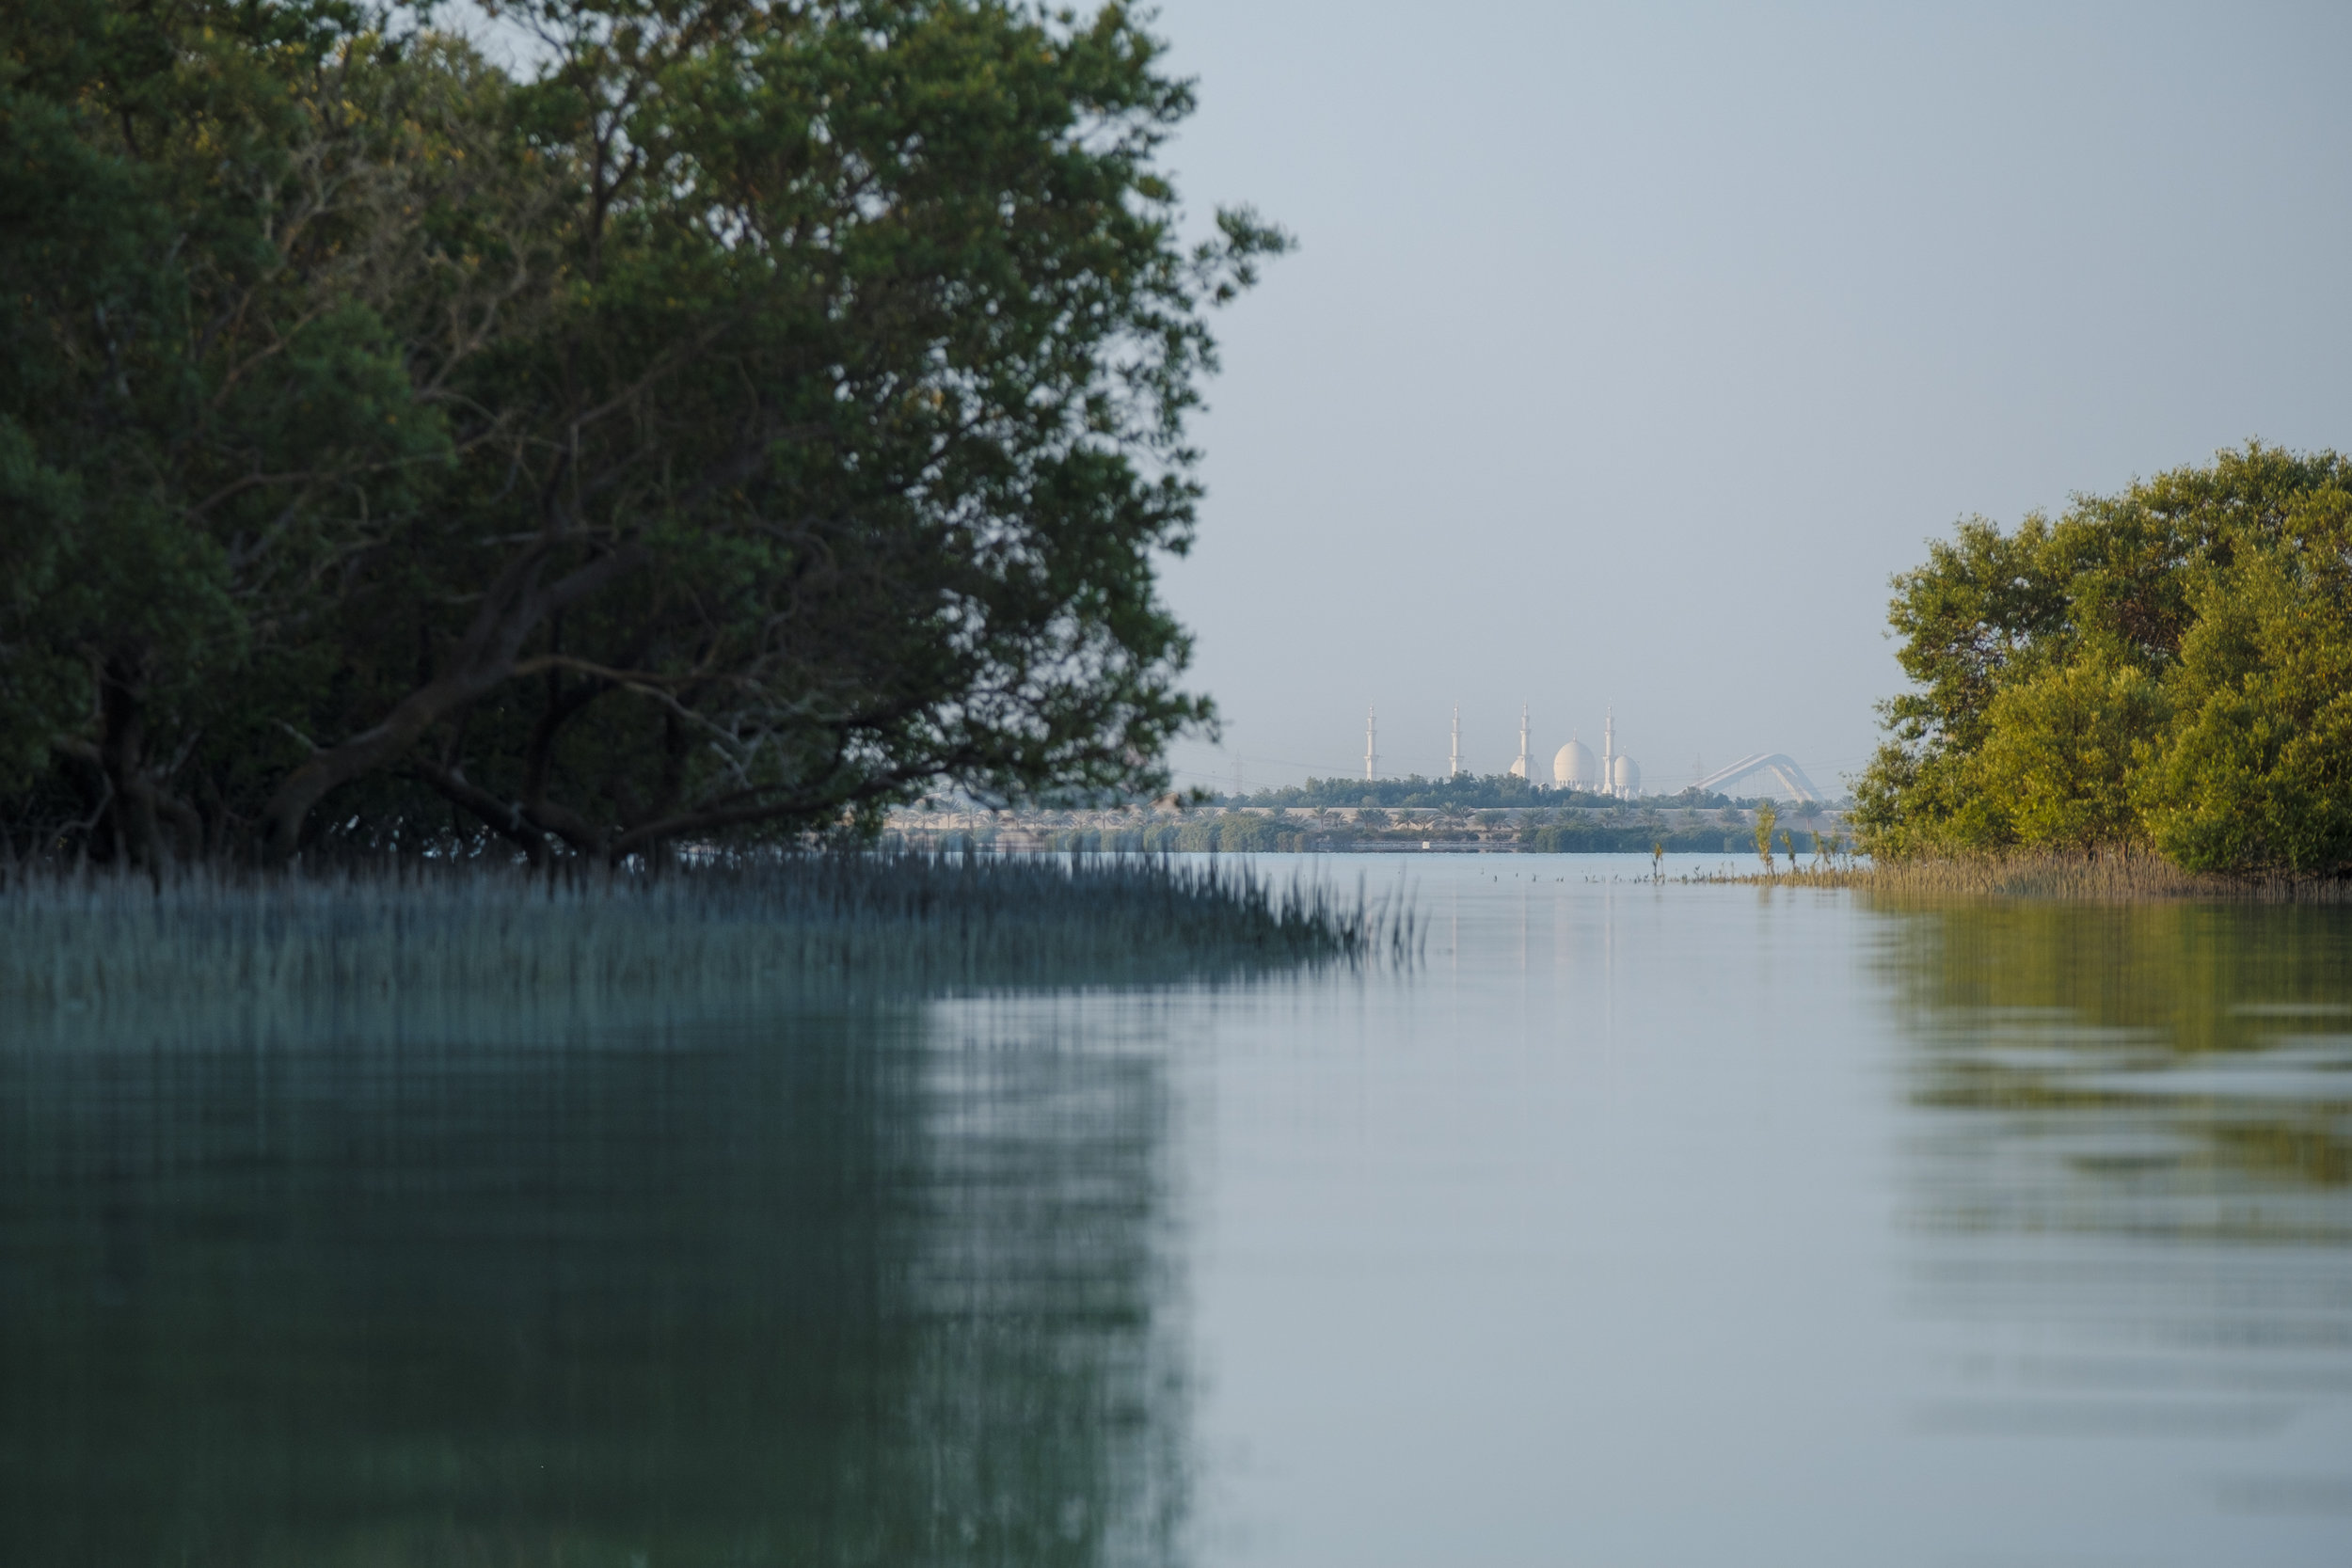 Sheikh Zayed grand mosque through mangroves 2_Abu Dhabi_(c)Oliver Wheeldon.jpg